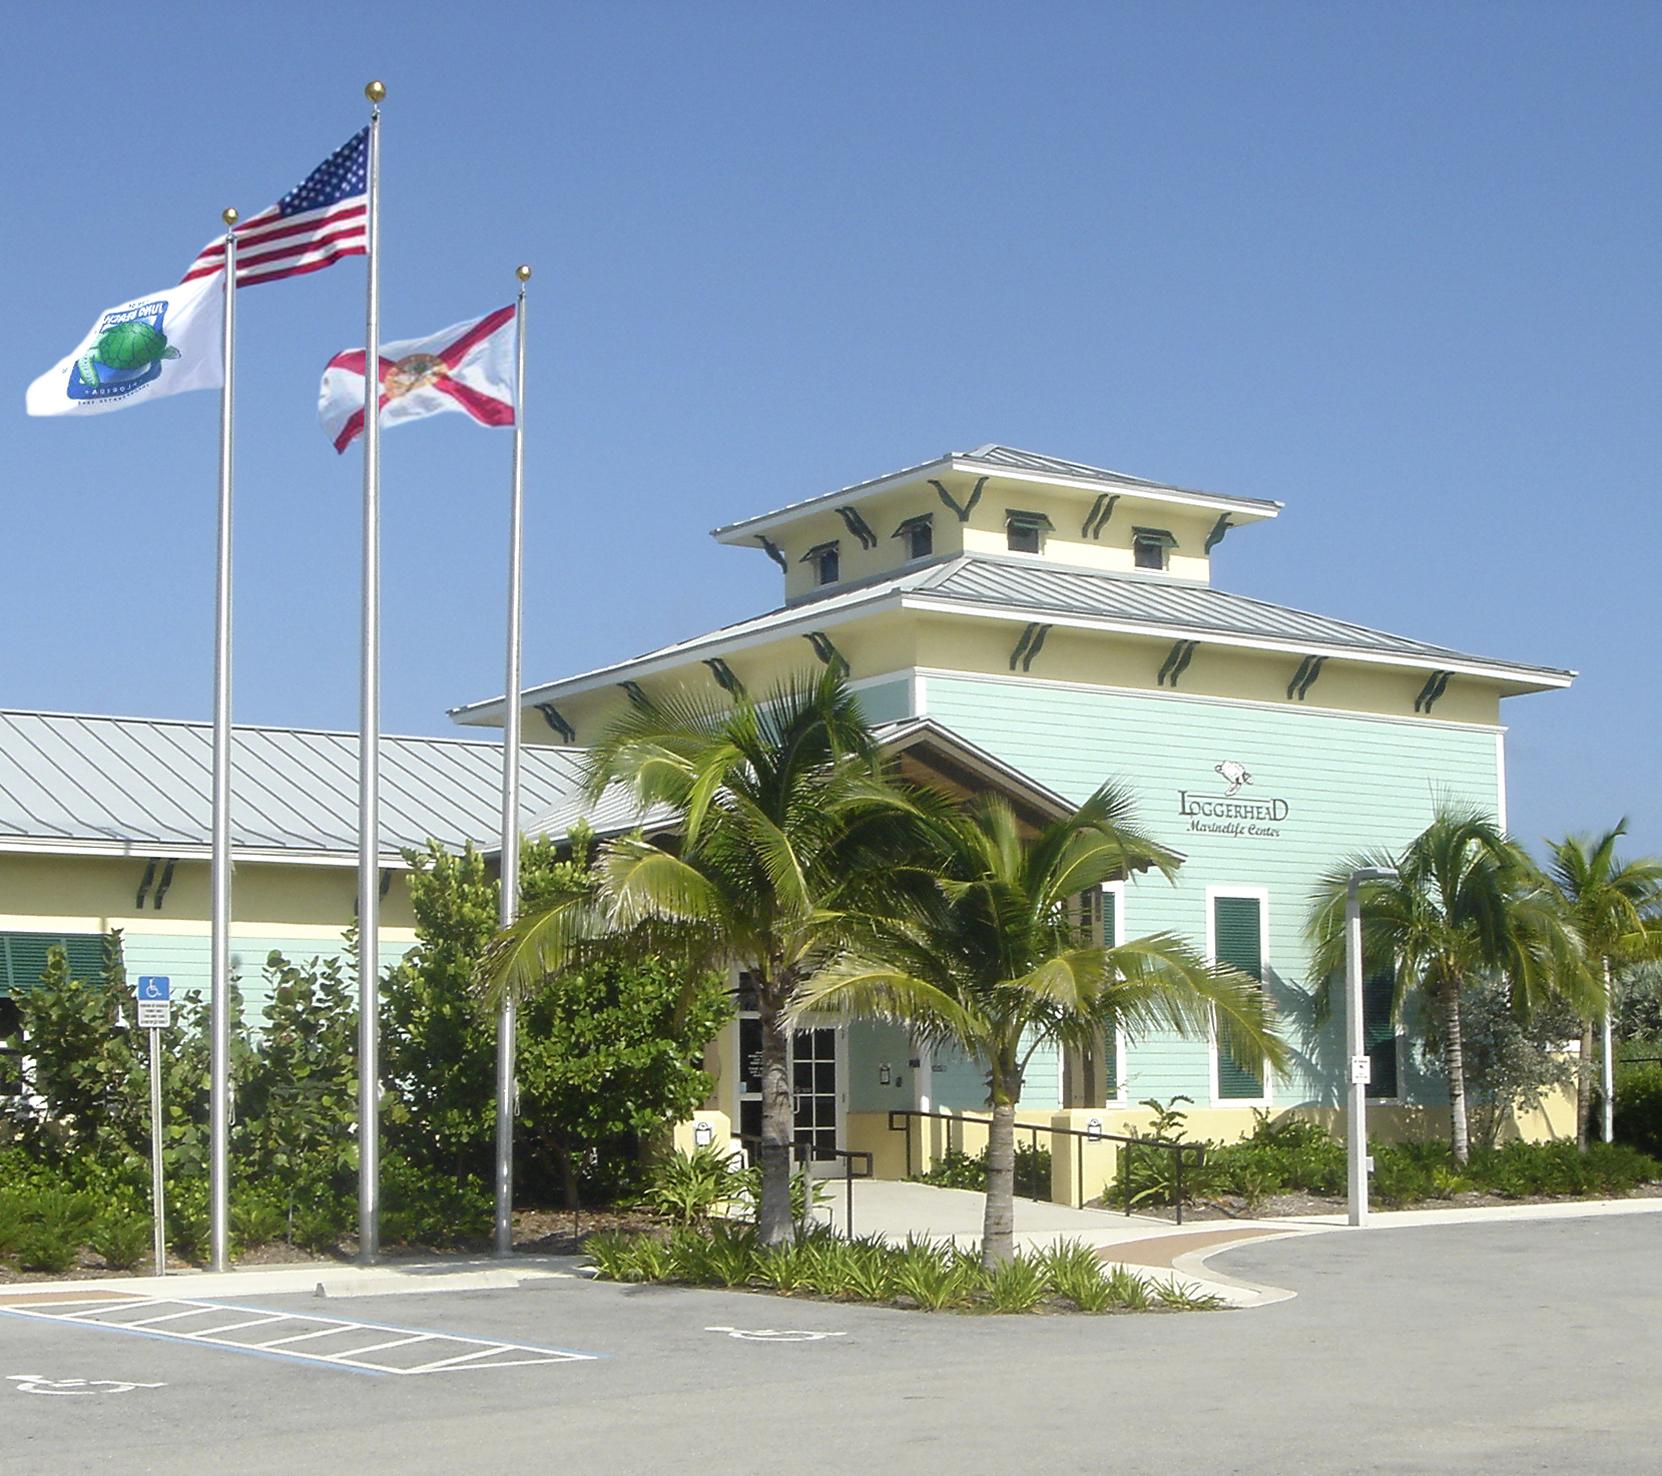 Loggerhead Marine Life Center Florida Green Building Juno Beach Florida Entry.jpg